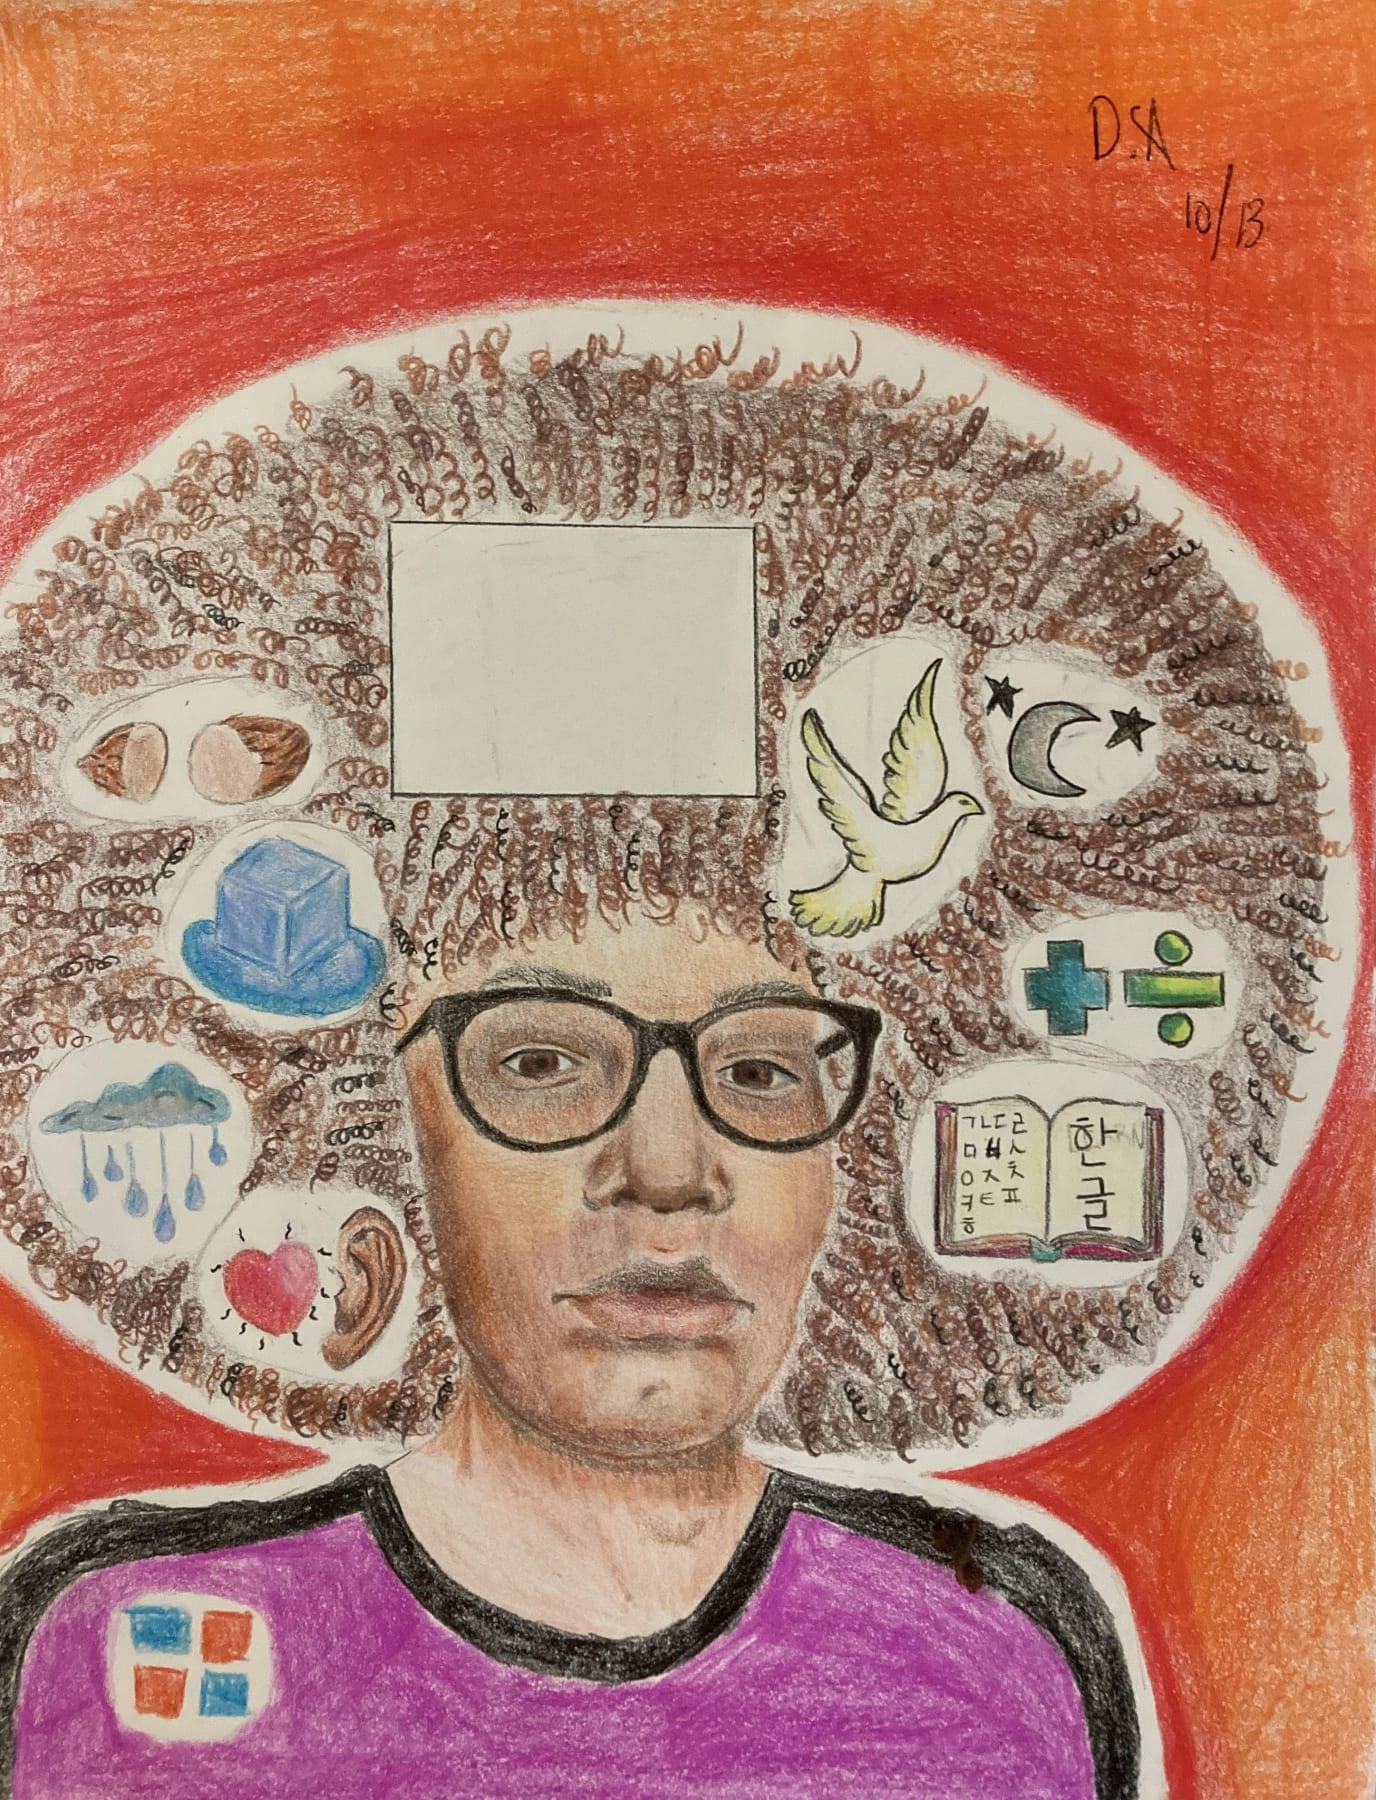 A self-portrait drawn by a student